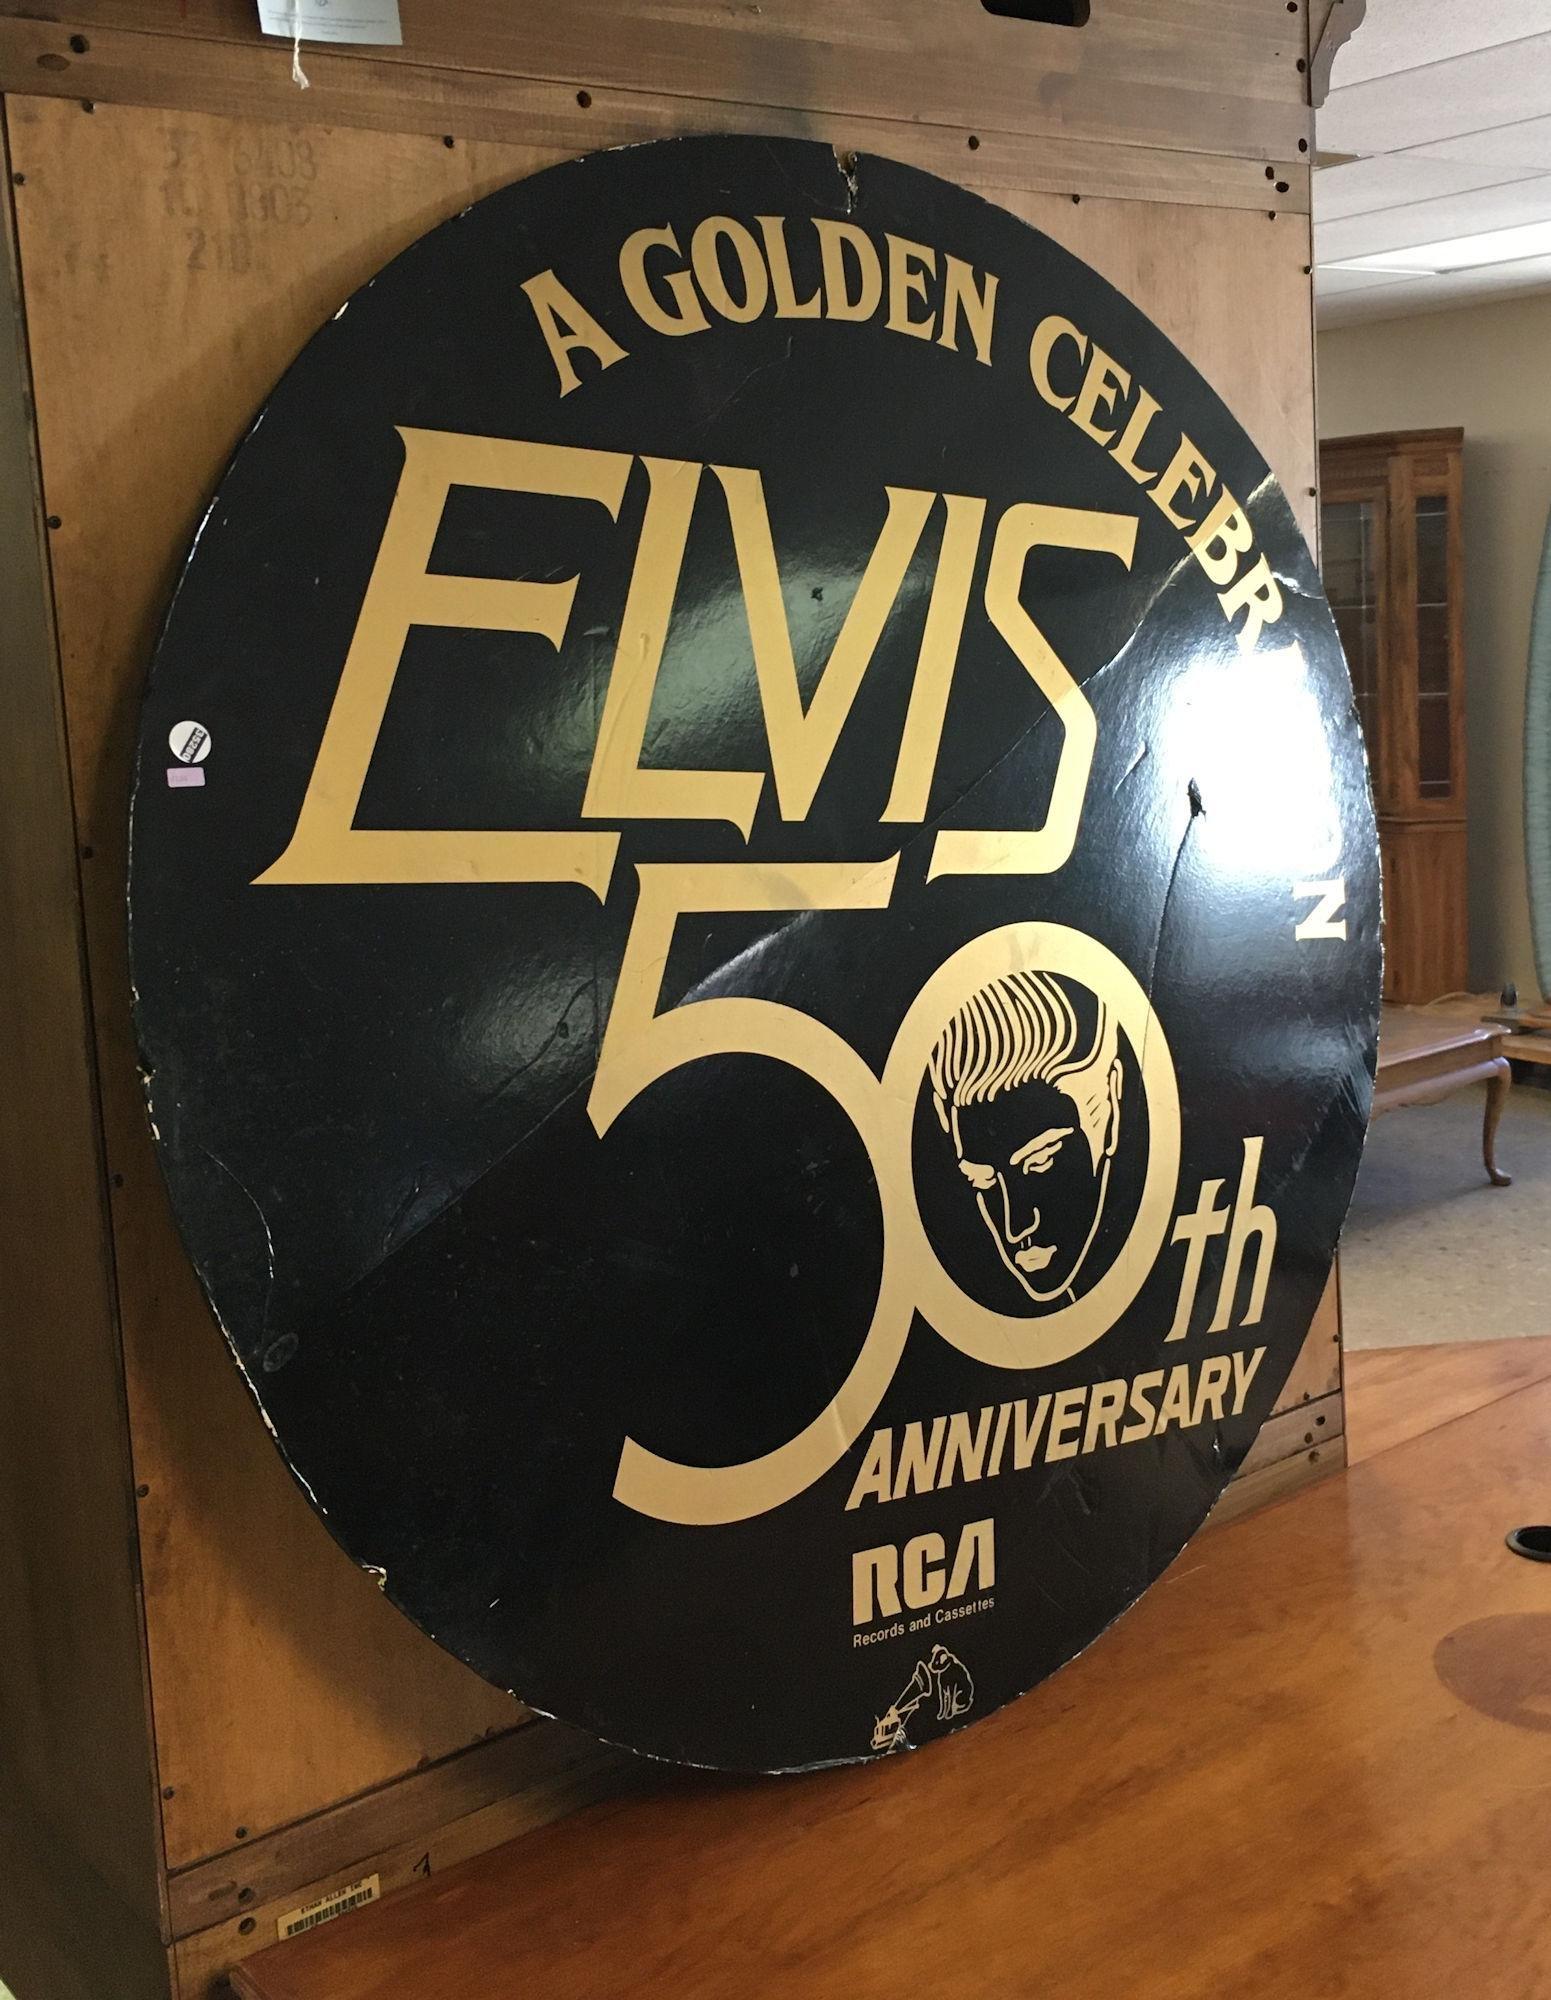 ELVIS 50TH ANNIVERSARY SIGN